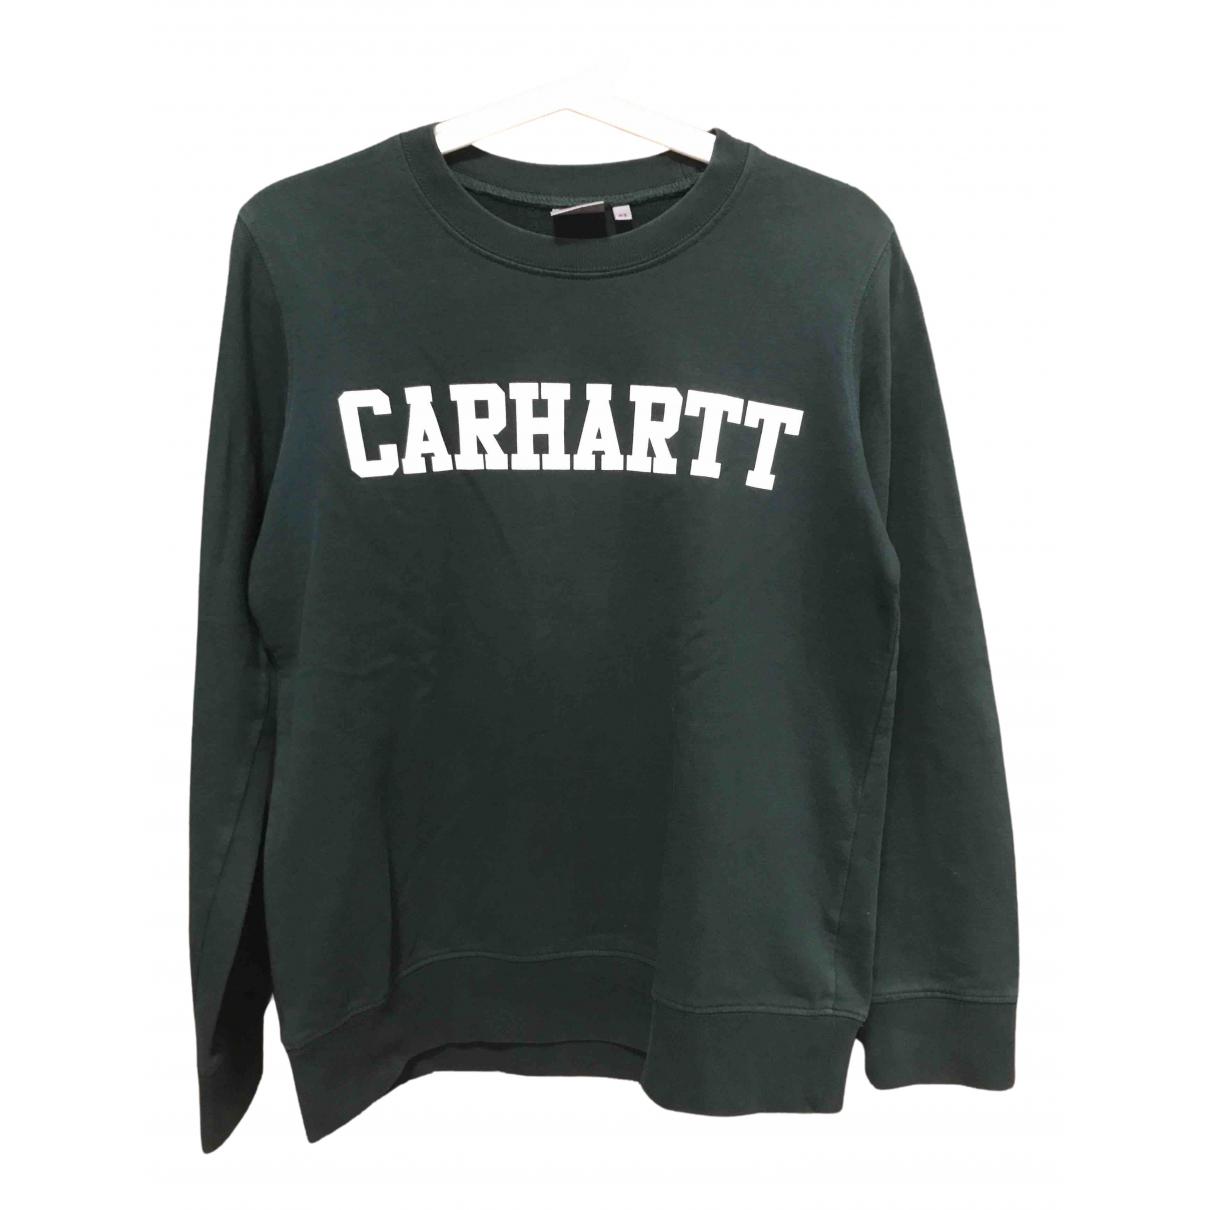 Carhartt - Pull   pour femme en coton - vert